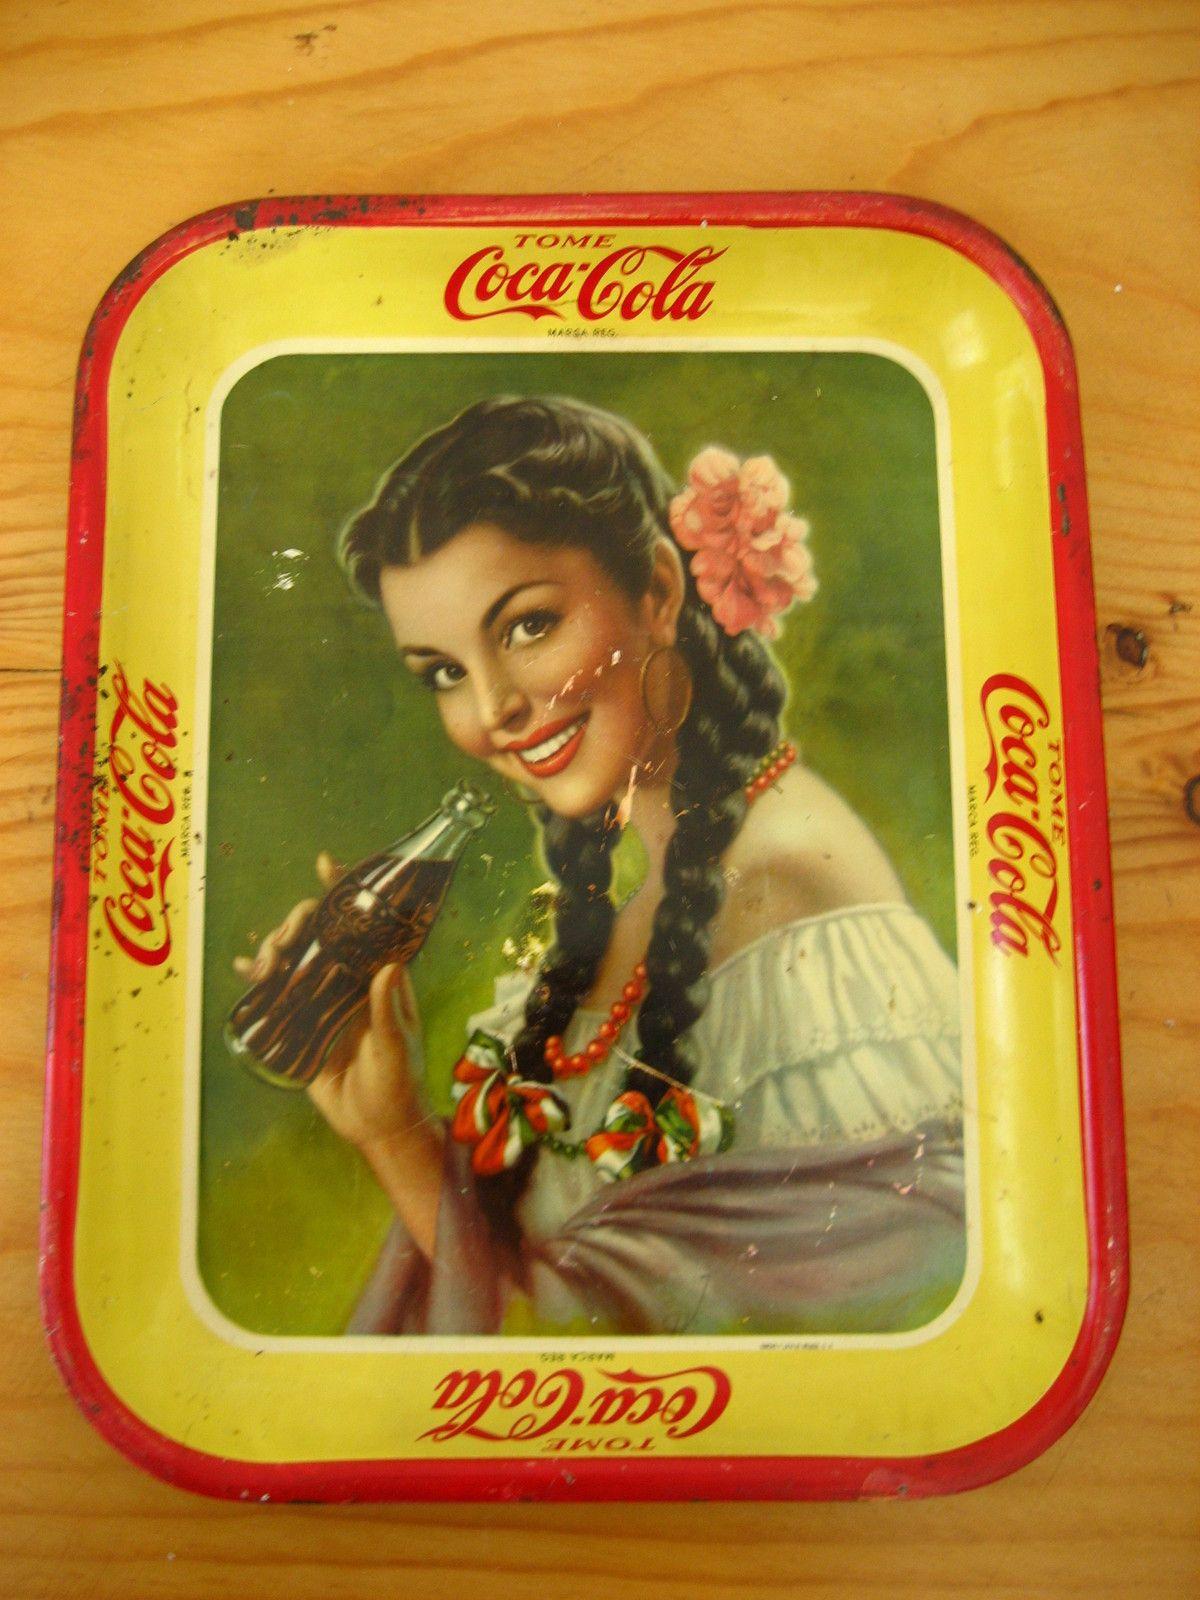 Vintage Coca Cola Tin Tray 1930s Mexico Authentic Beautiful Senorita